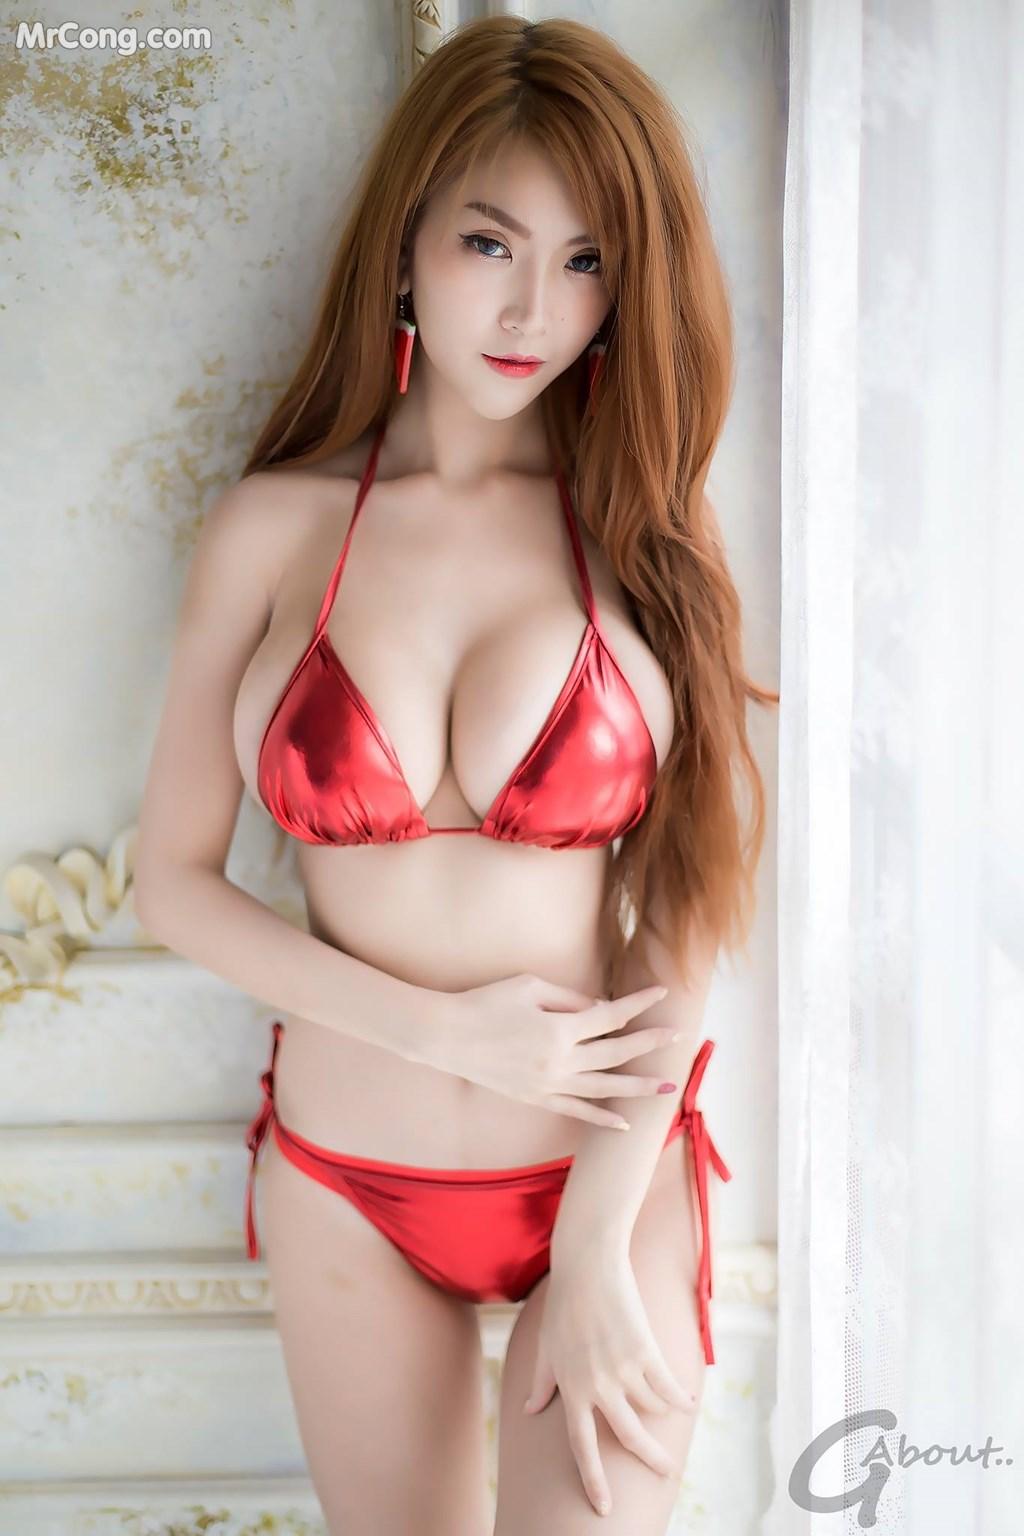 Image Thai-Model-No.482-Alisa-Rattanachawangkul-MrCong.com-009 in post Thai Model No.482: Người mẫu Alisa Rattanachawangkul (9 ảnh)